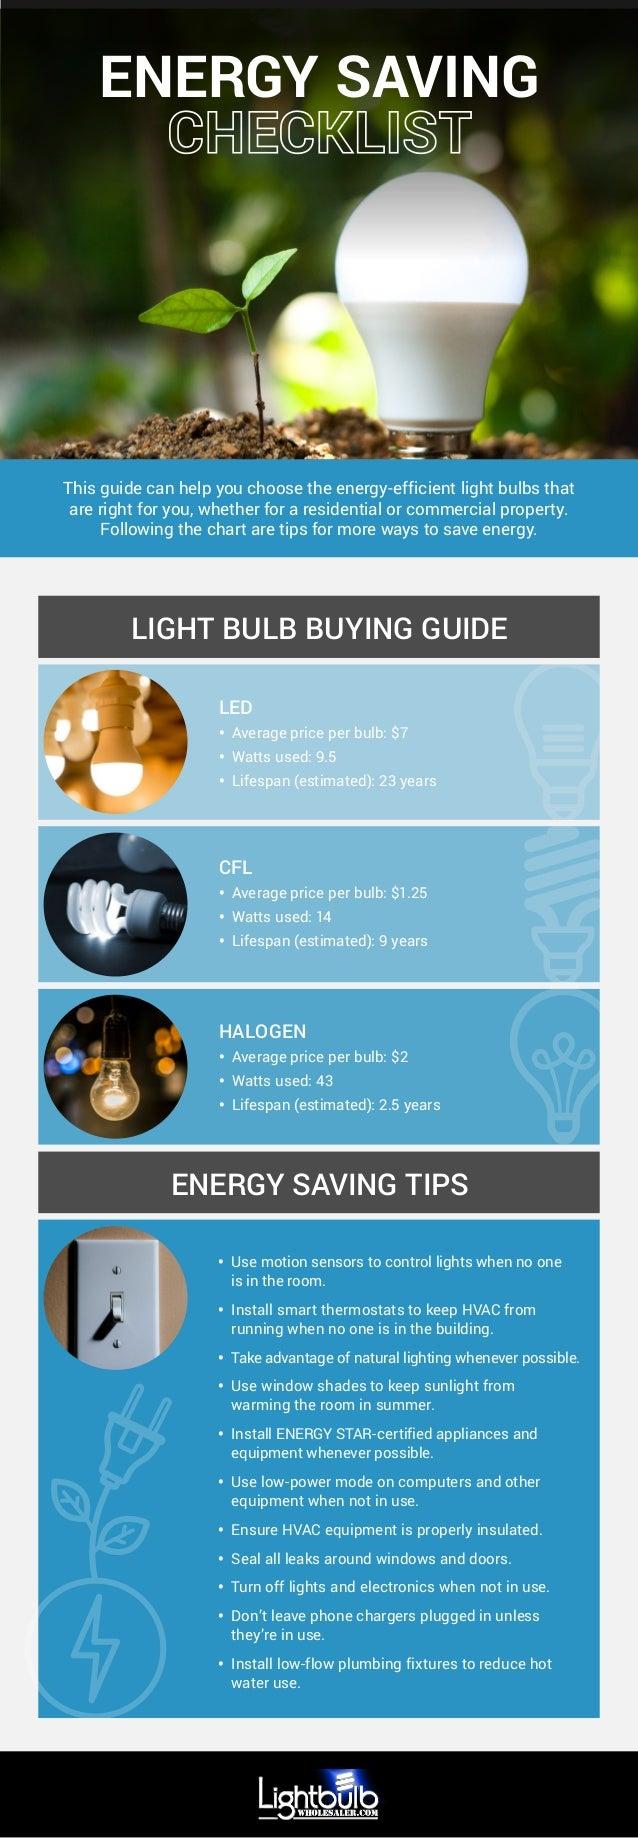 energy-saving-checklist-1-638